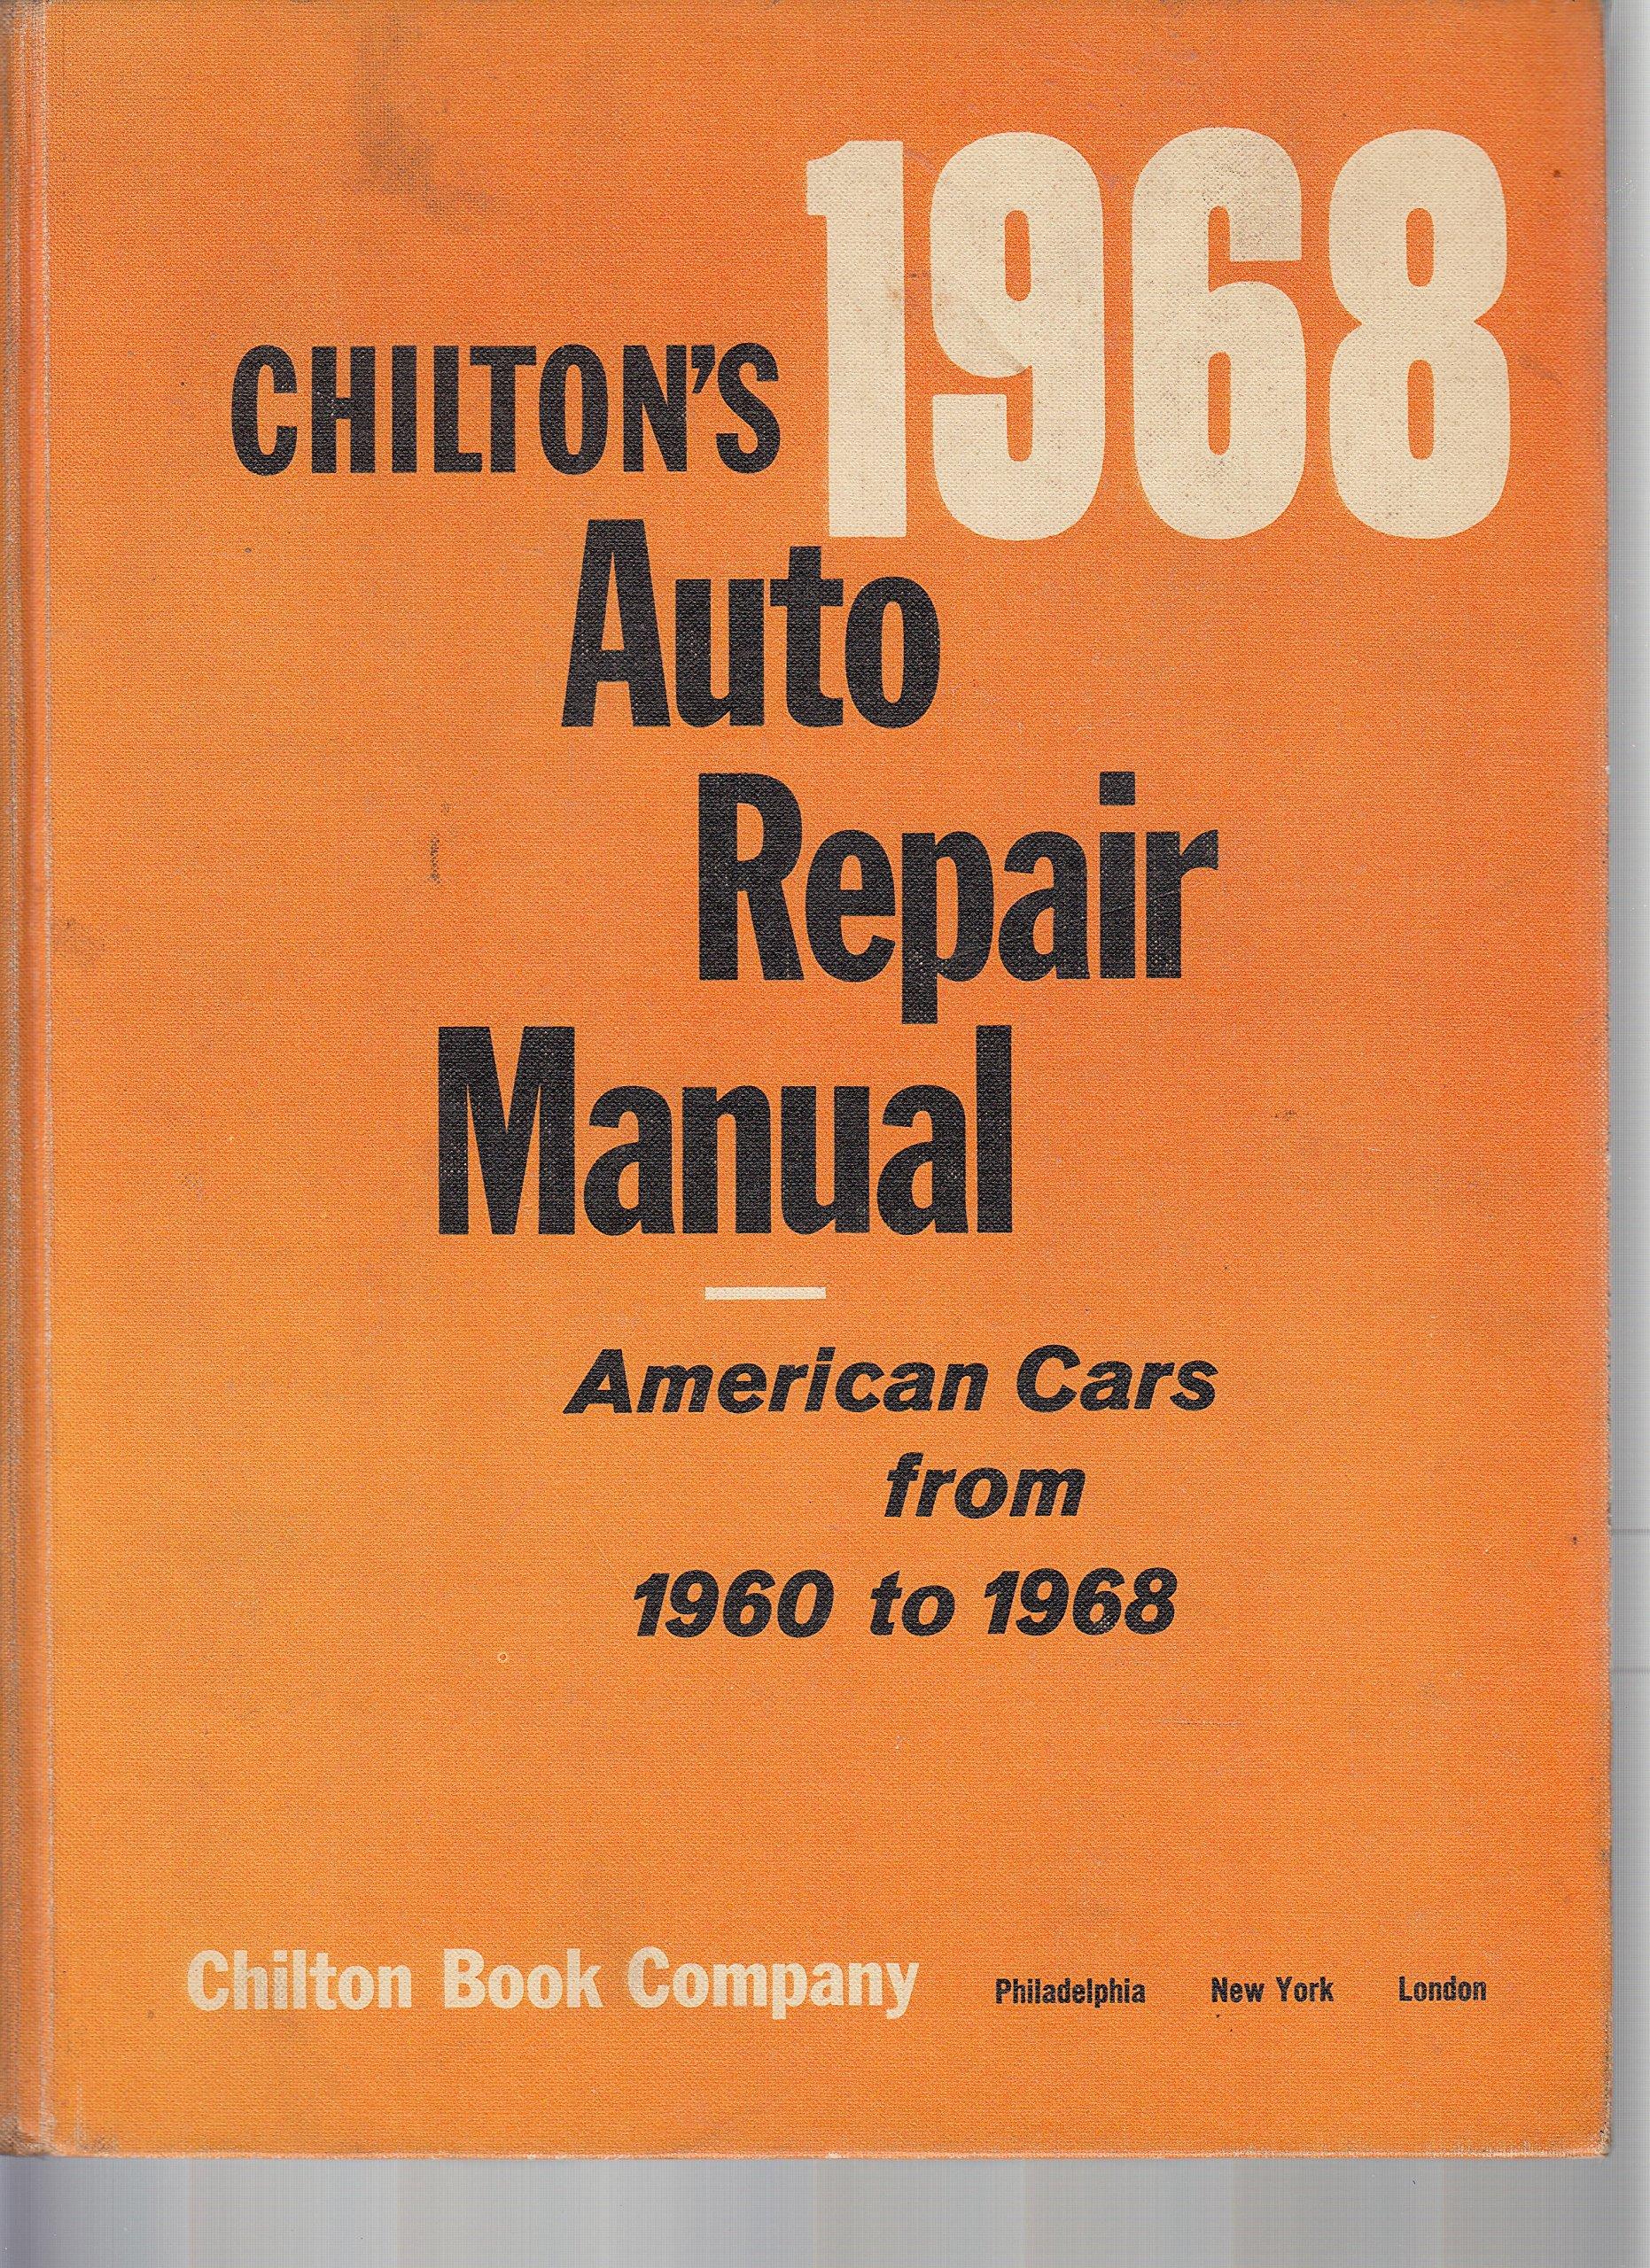 Chilton's Auto Repair Manual 1968: American Cars from 1960 to 1968:  Unknown: Amazon.com: Books